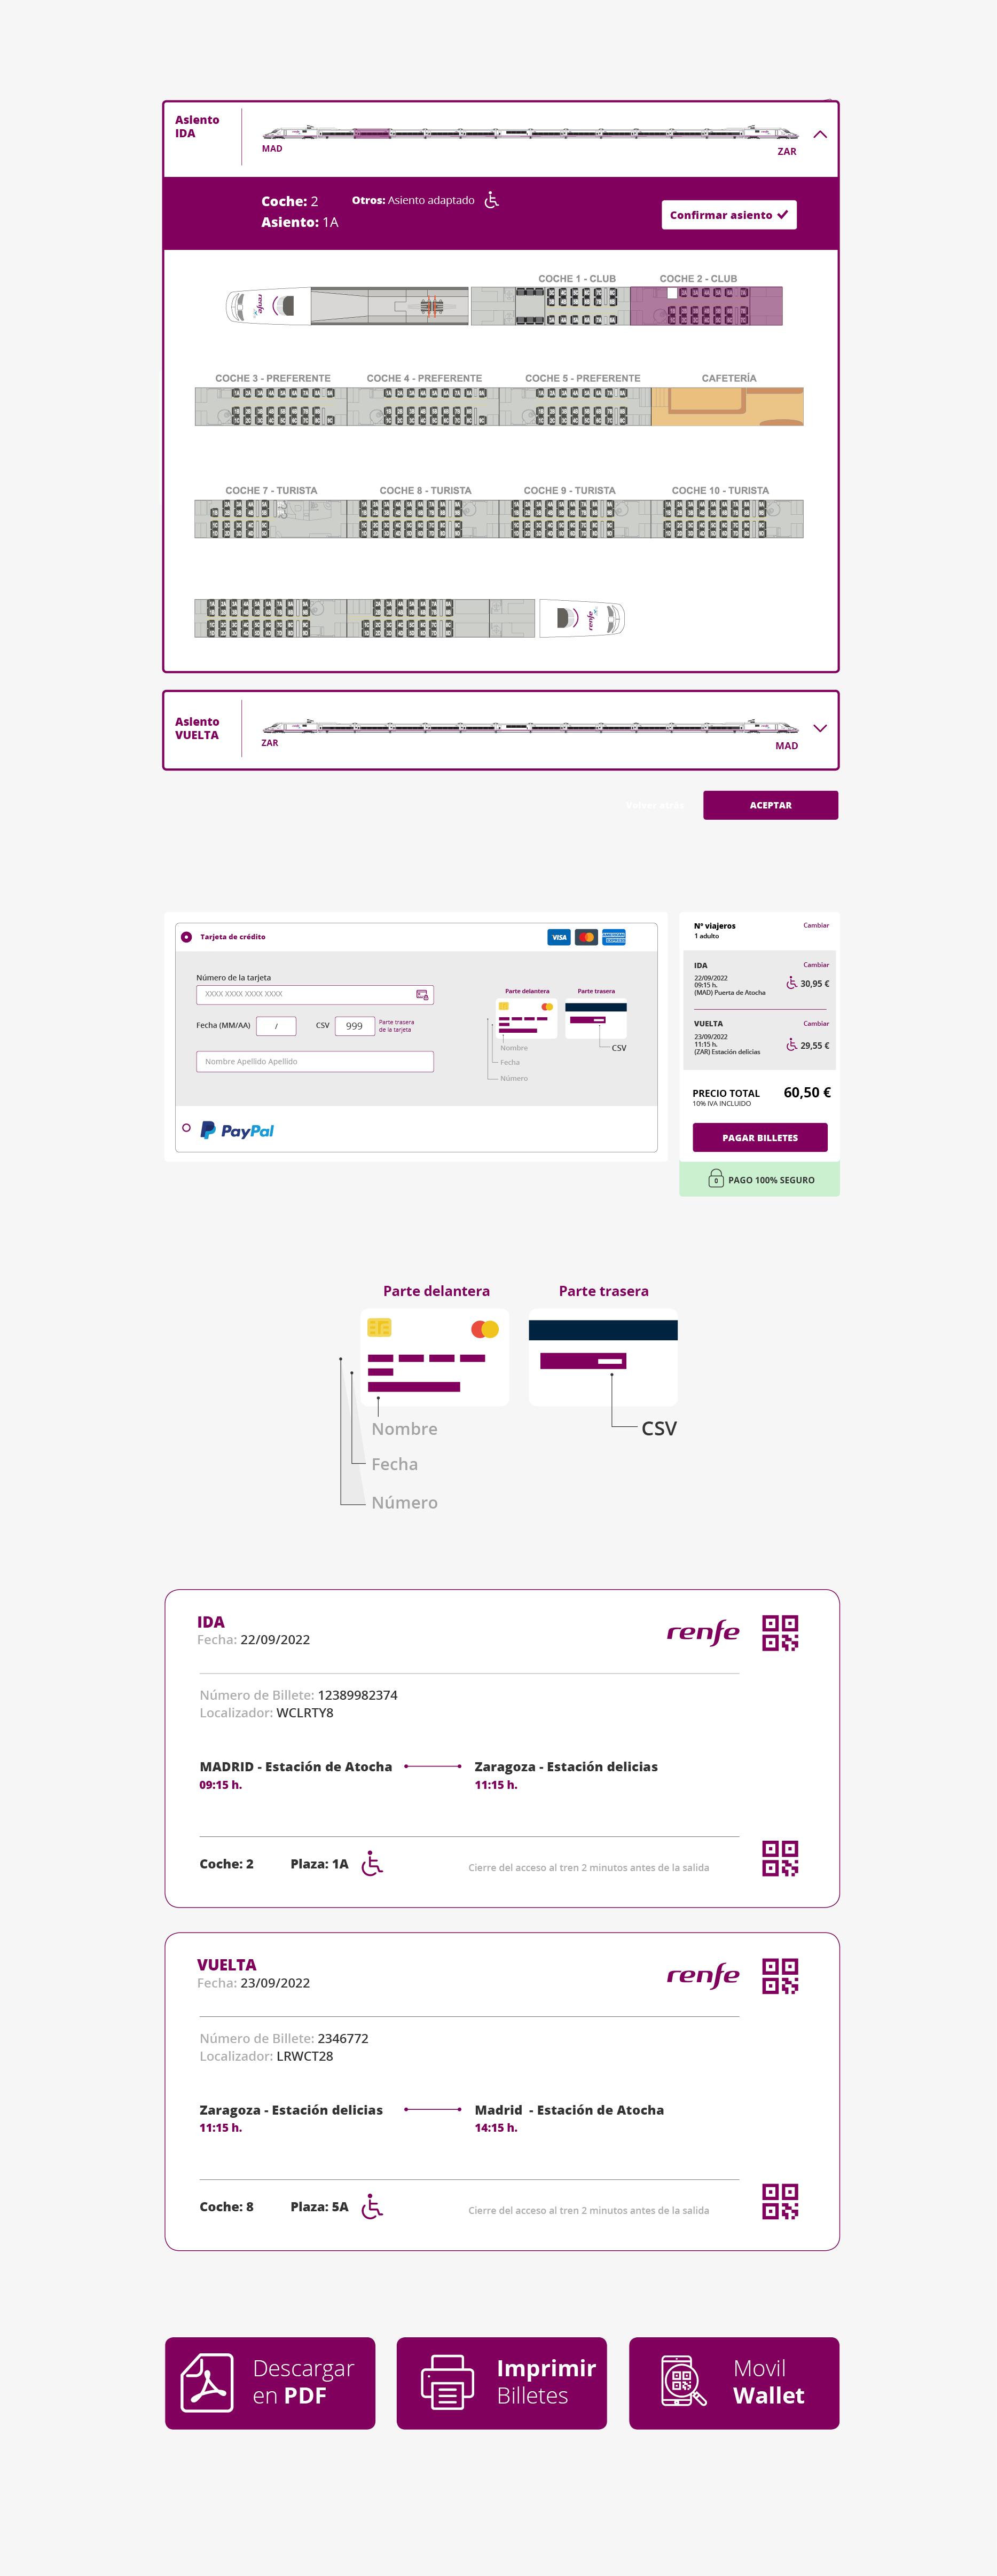 rediseño-web-renfe-diseño-nuevo-2019-202010